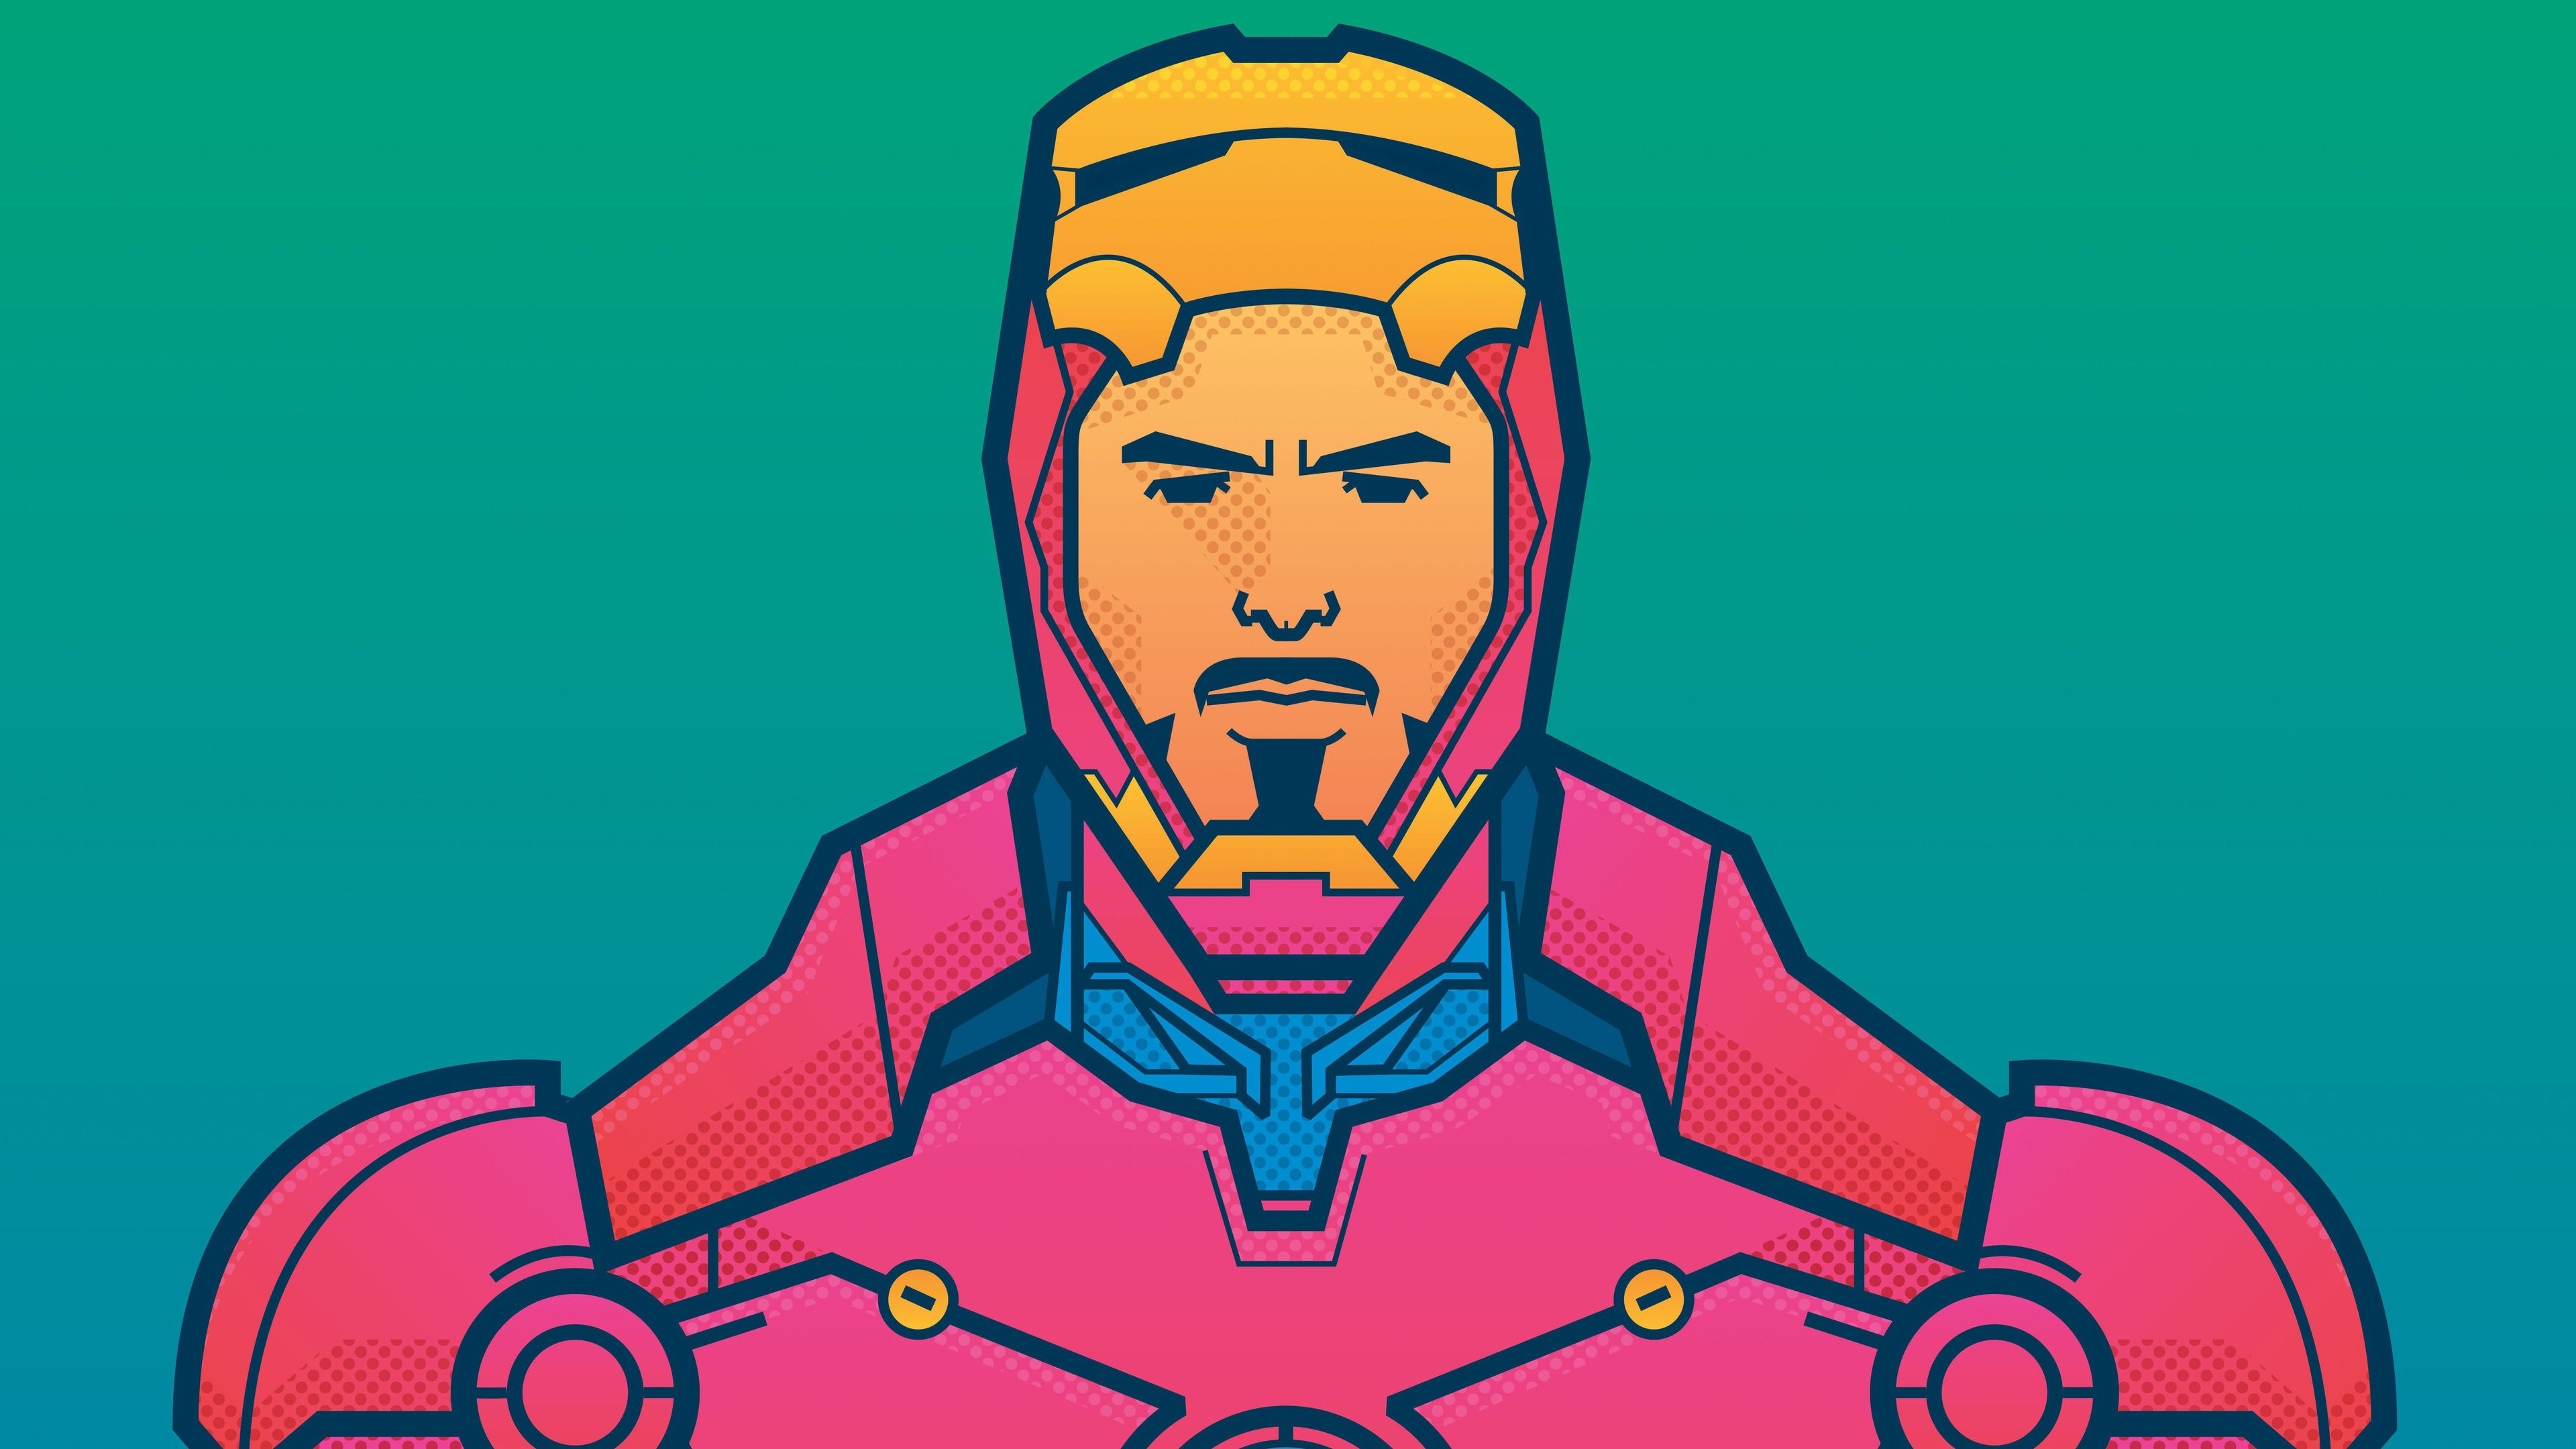 Iron Man Art 4k Superheroes Wallpapers Iron Man Wallpapers Hd